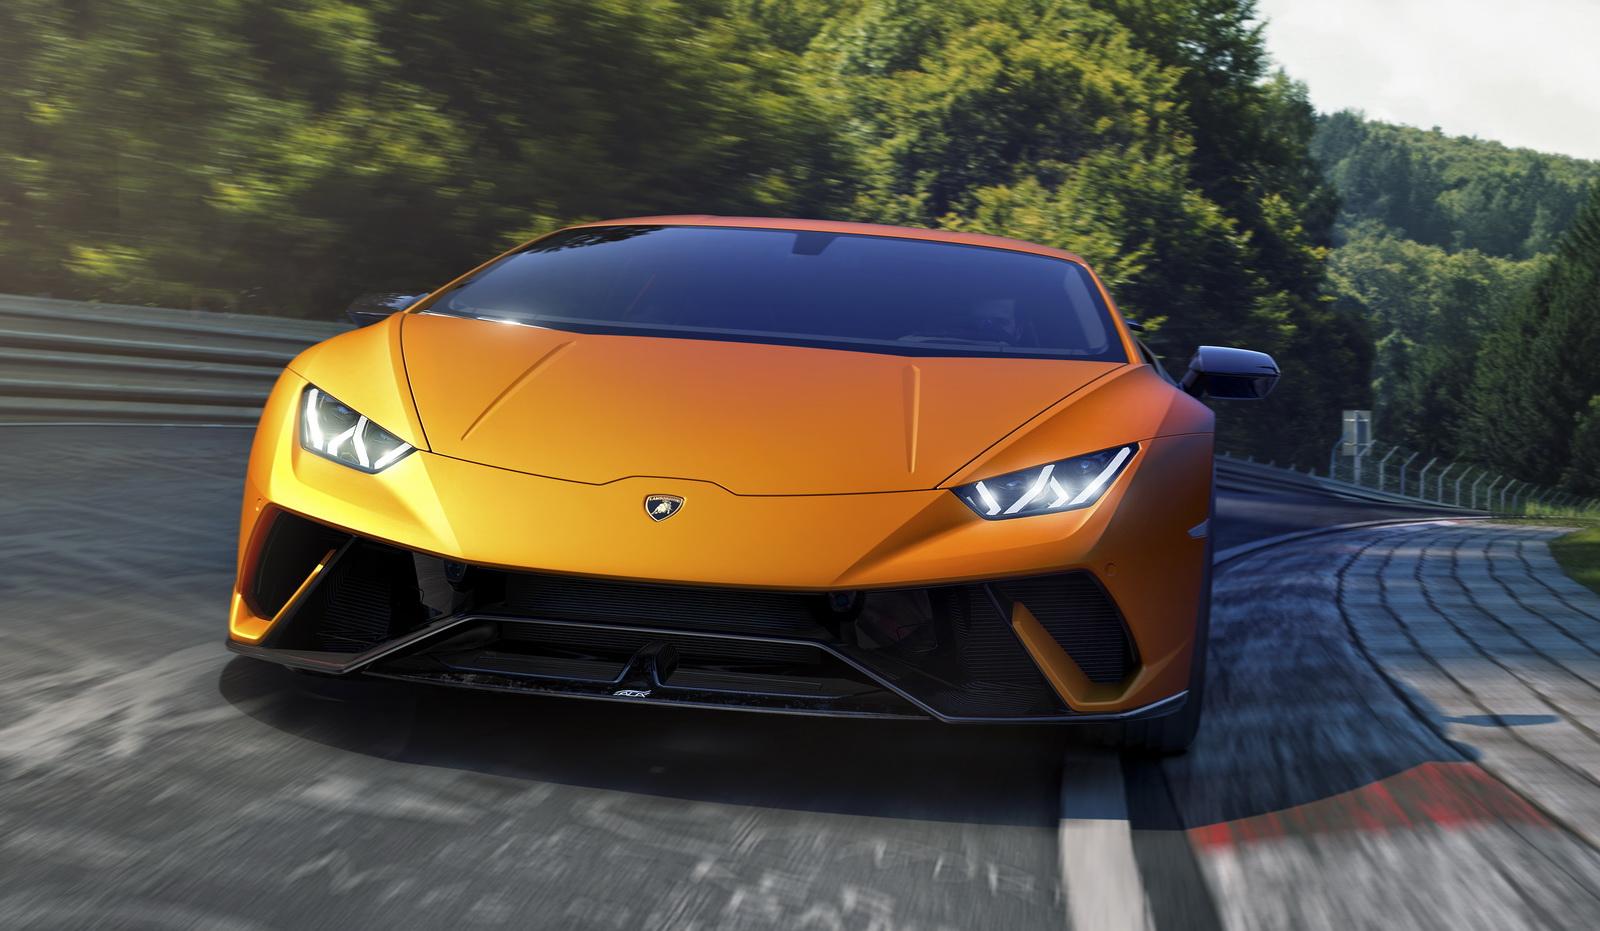 Lamborghini Huracan Performante 2018 (9)